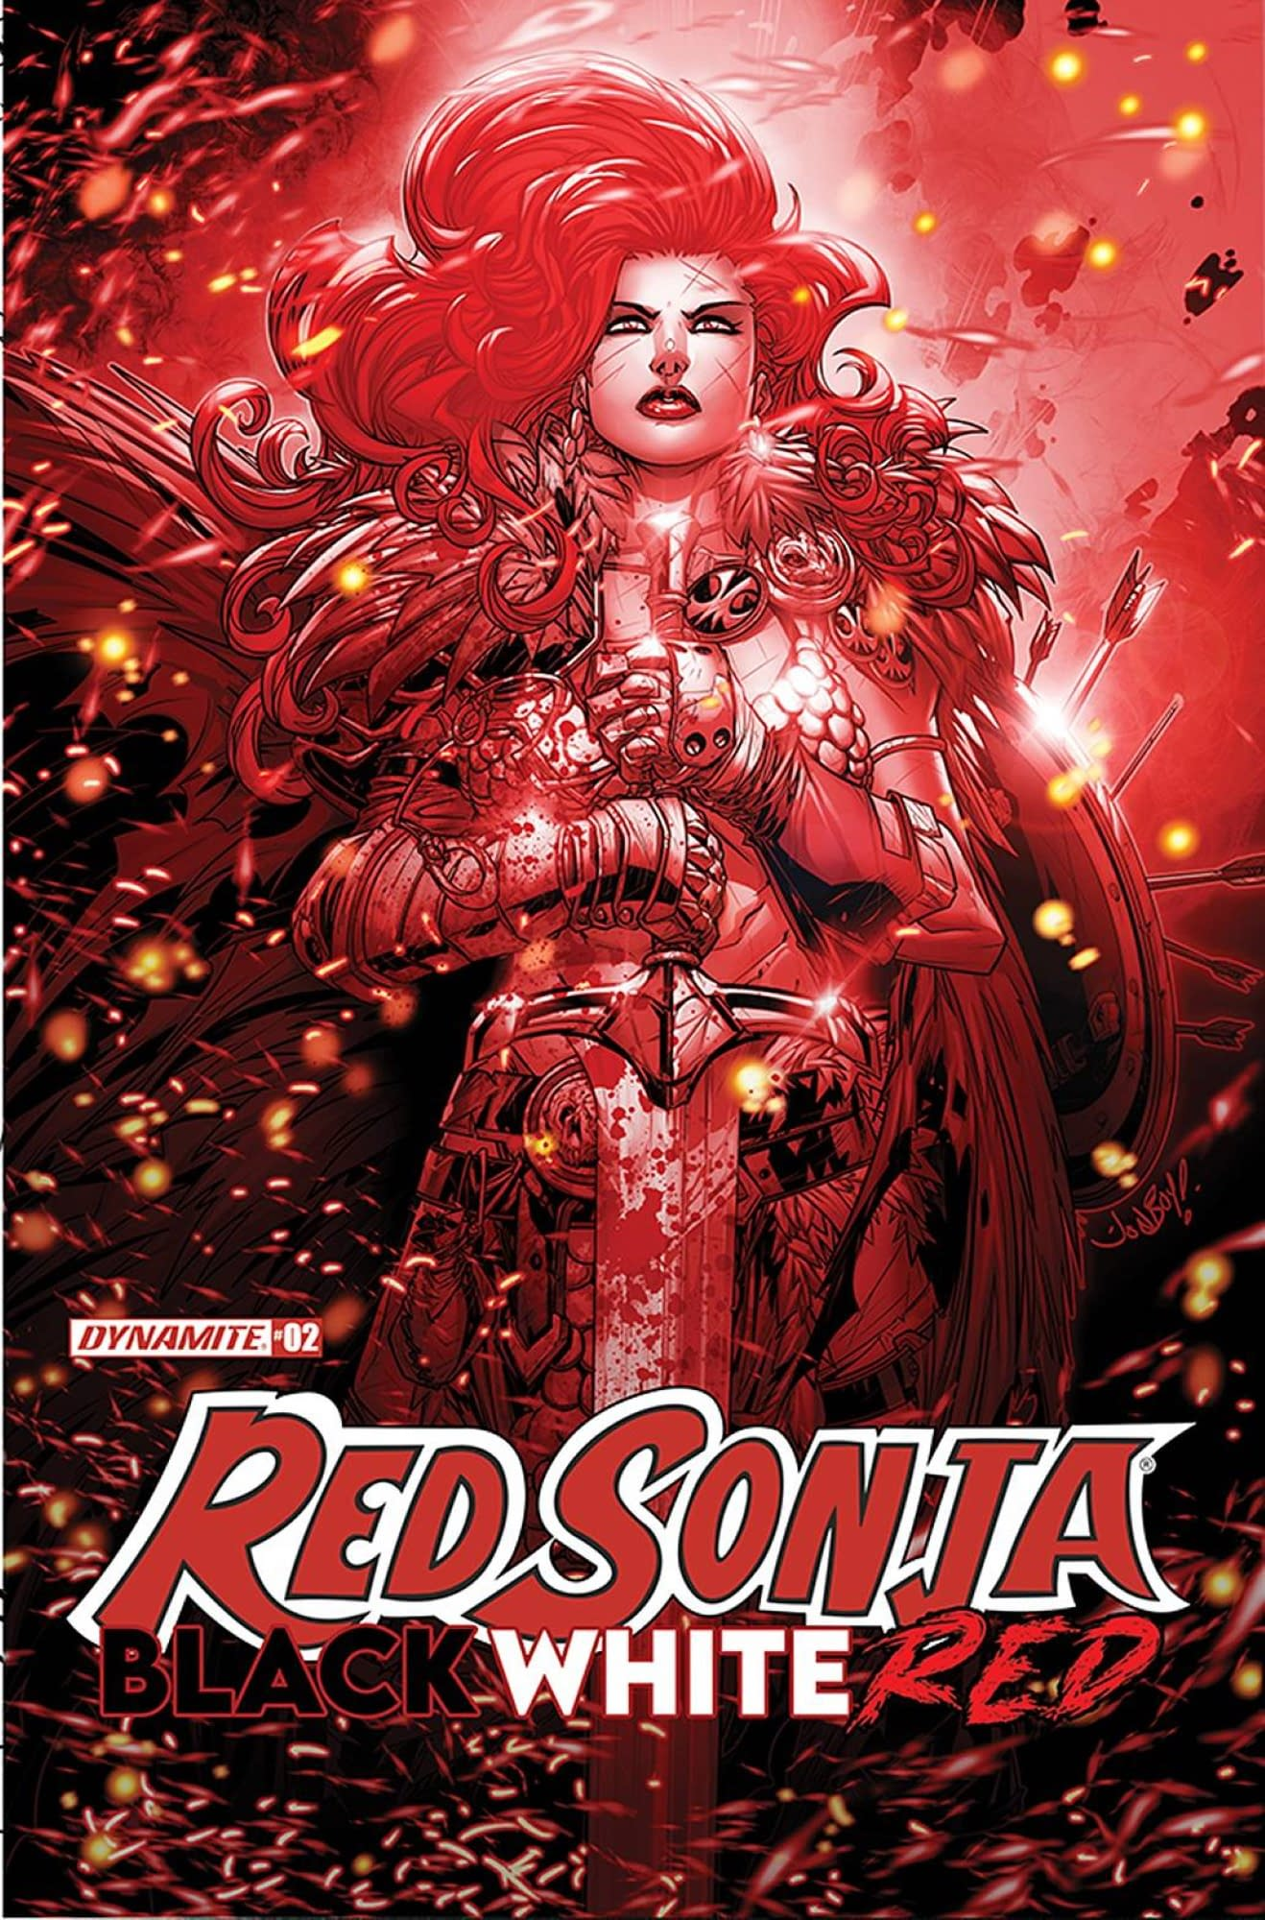 RED SONJA BLACK WHITE RED #2 CVR B MEYERS